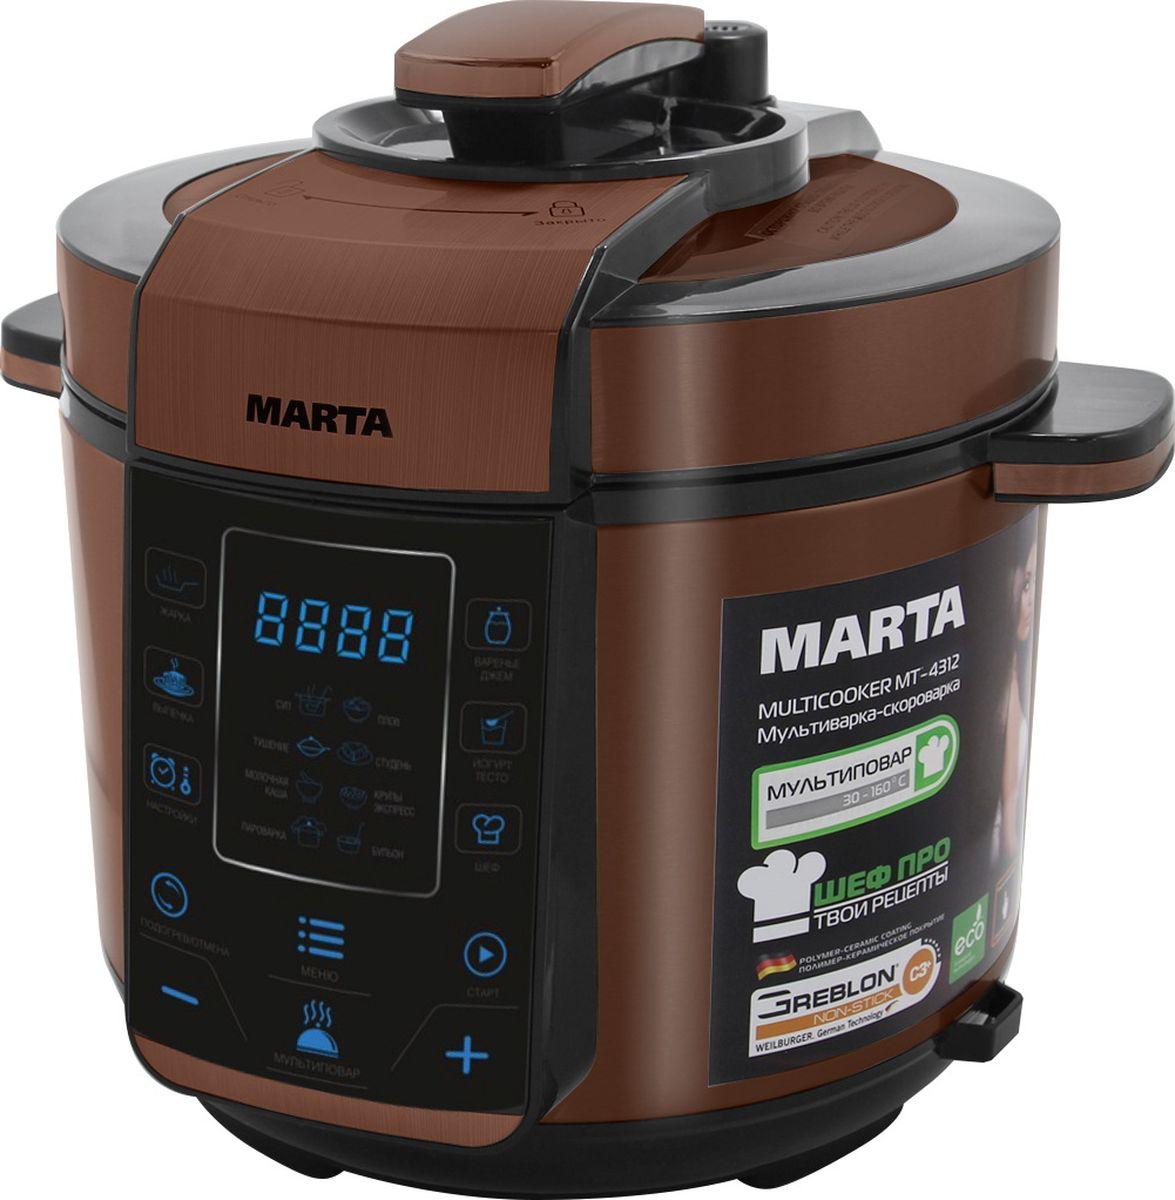 Marta MT-4312, Black Copper мультиварка